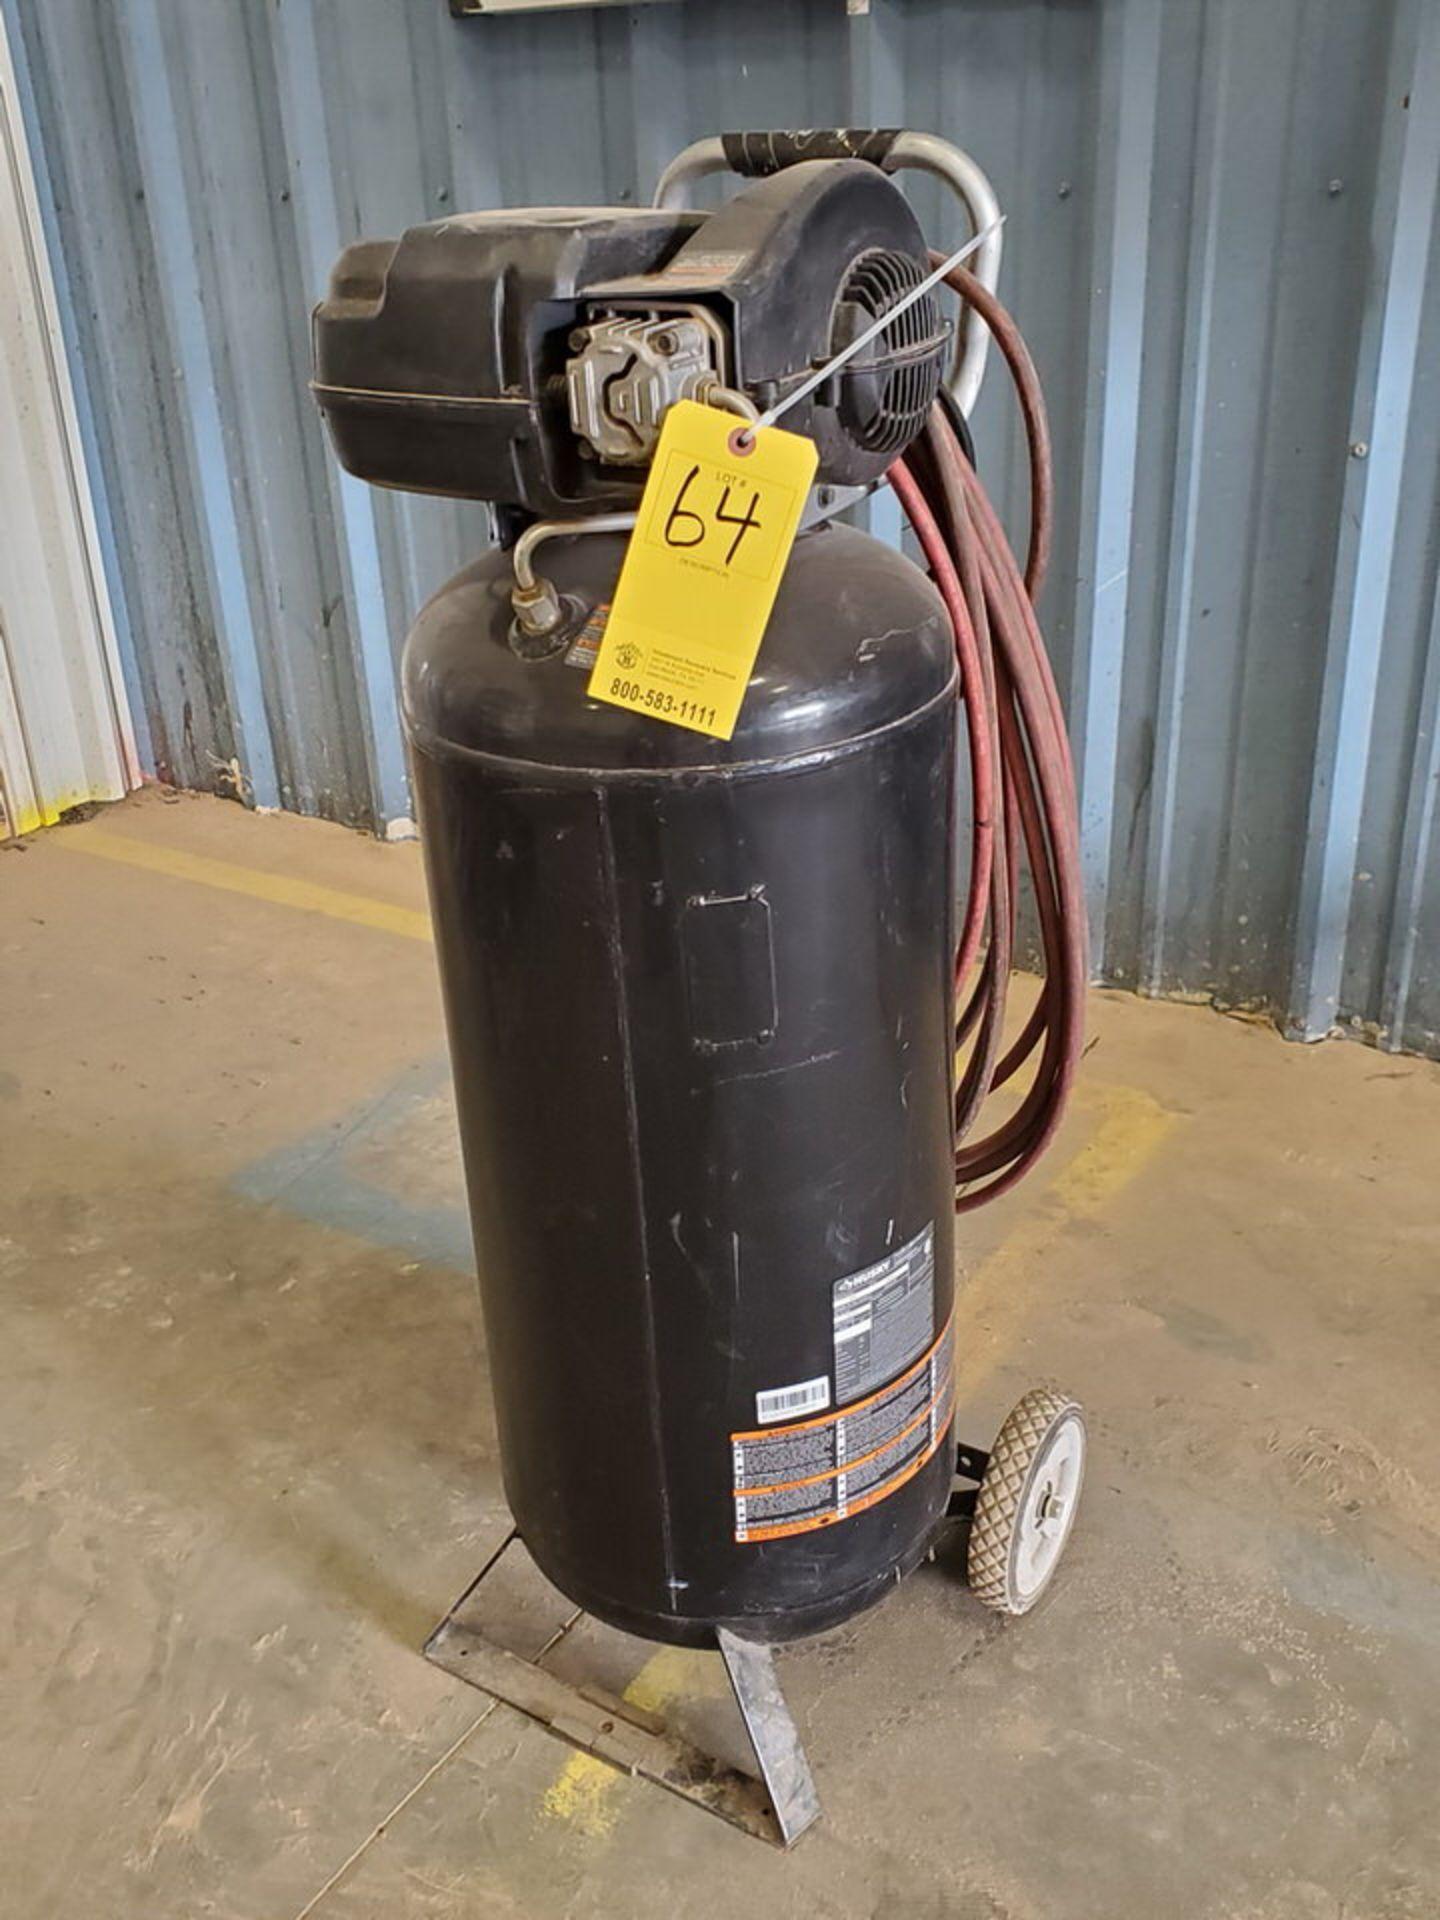 Husky C201H Portable Air Compressor 175psi - Image 3 of 5